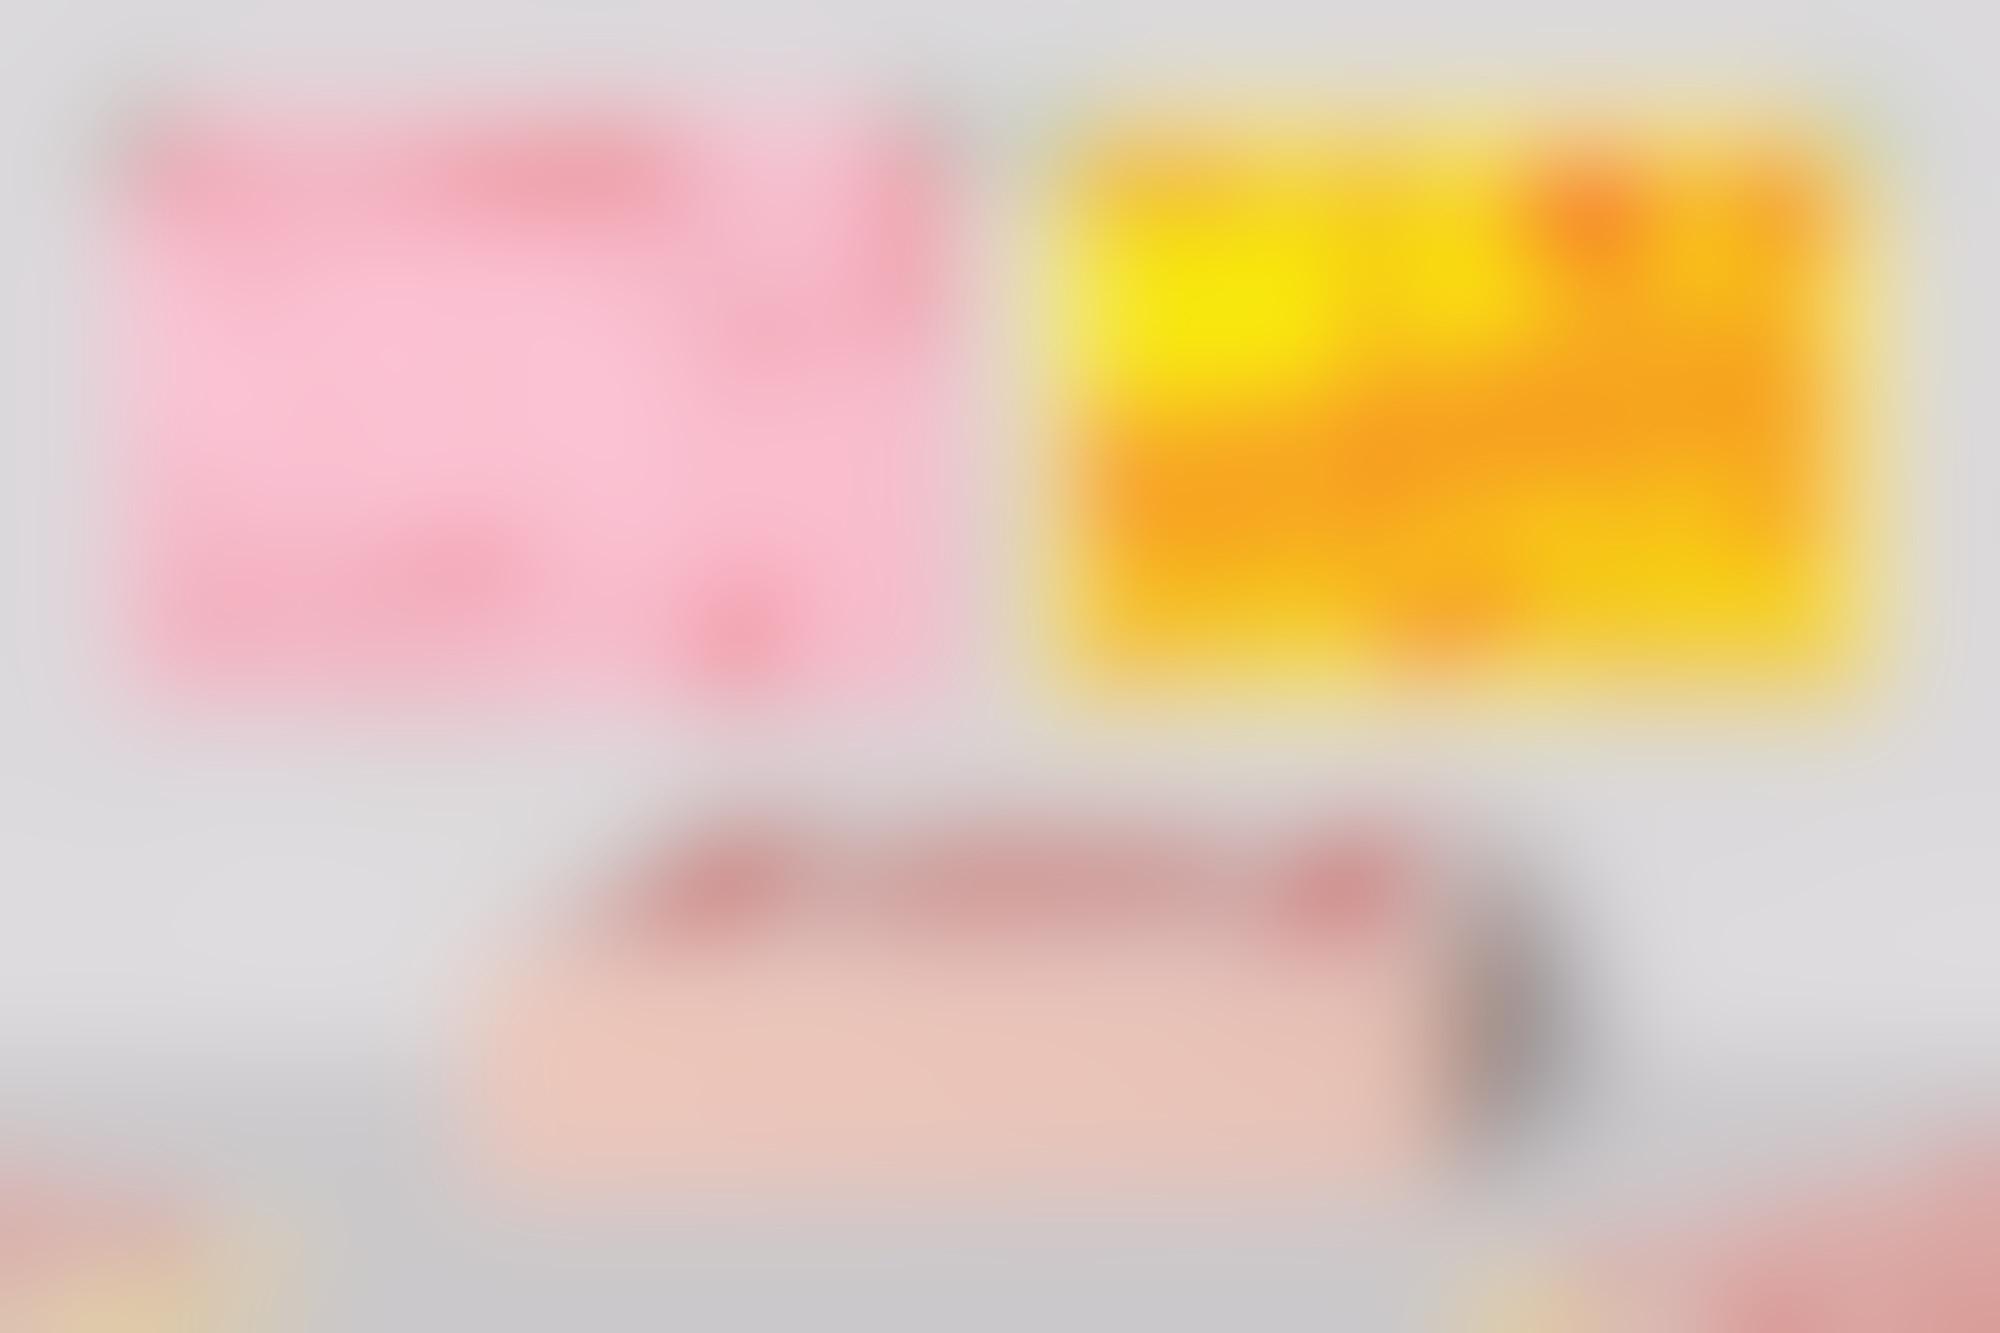 RISOTTO Weekly Planner Jumbo Notepad 2017 autocompressfitresizeixlibphp 1 1 0max h2000max w3 D2000q80sc96024cf98c974fd68ffcd311566ffad